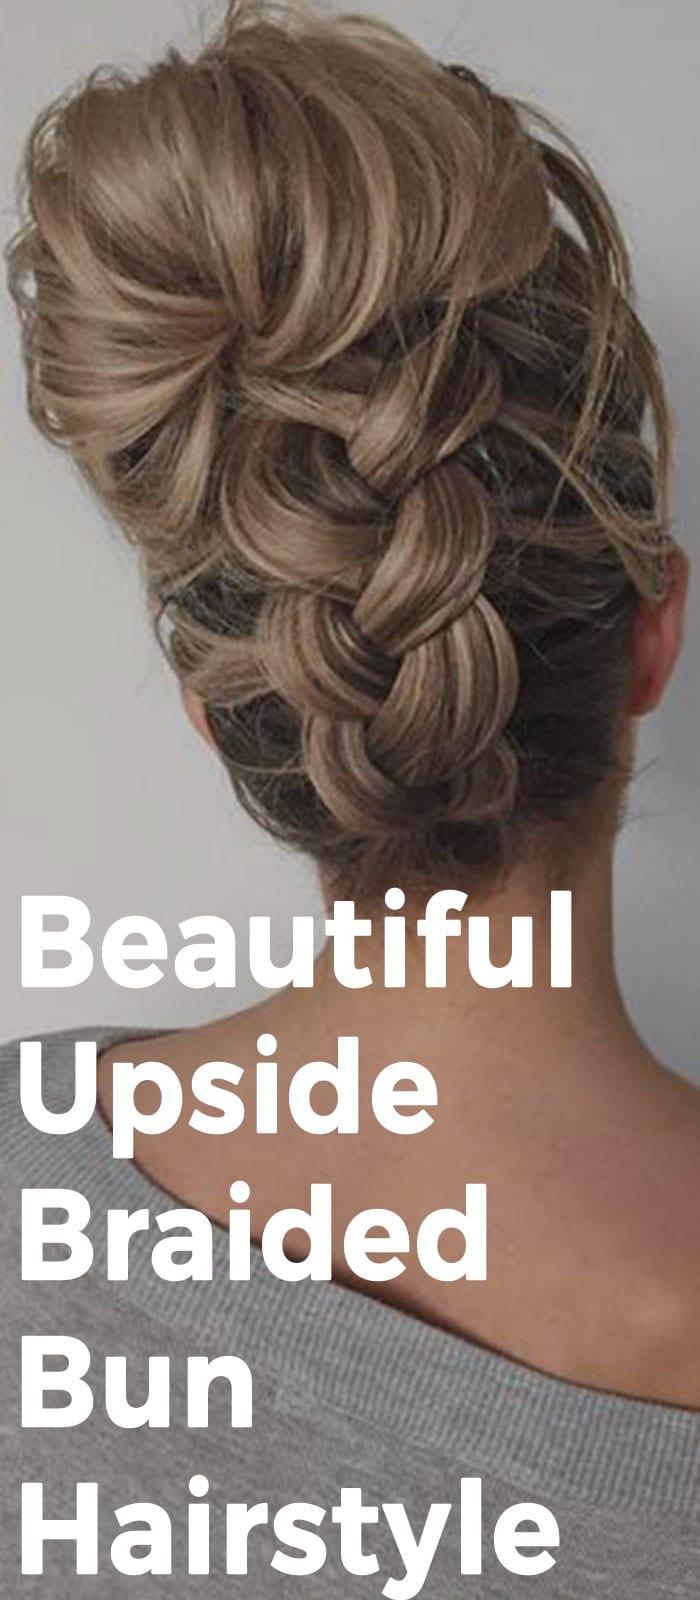 Beautiful Upside Braided Bun Hairstyle